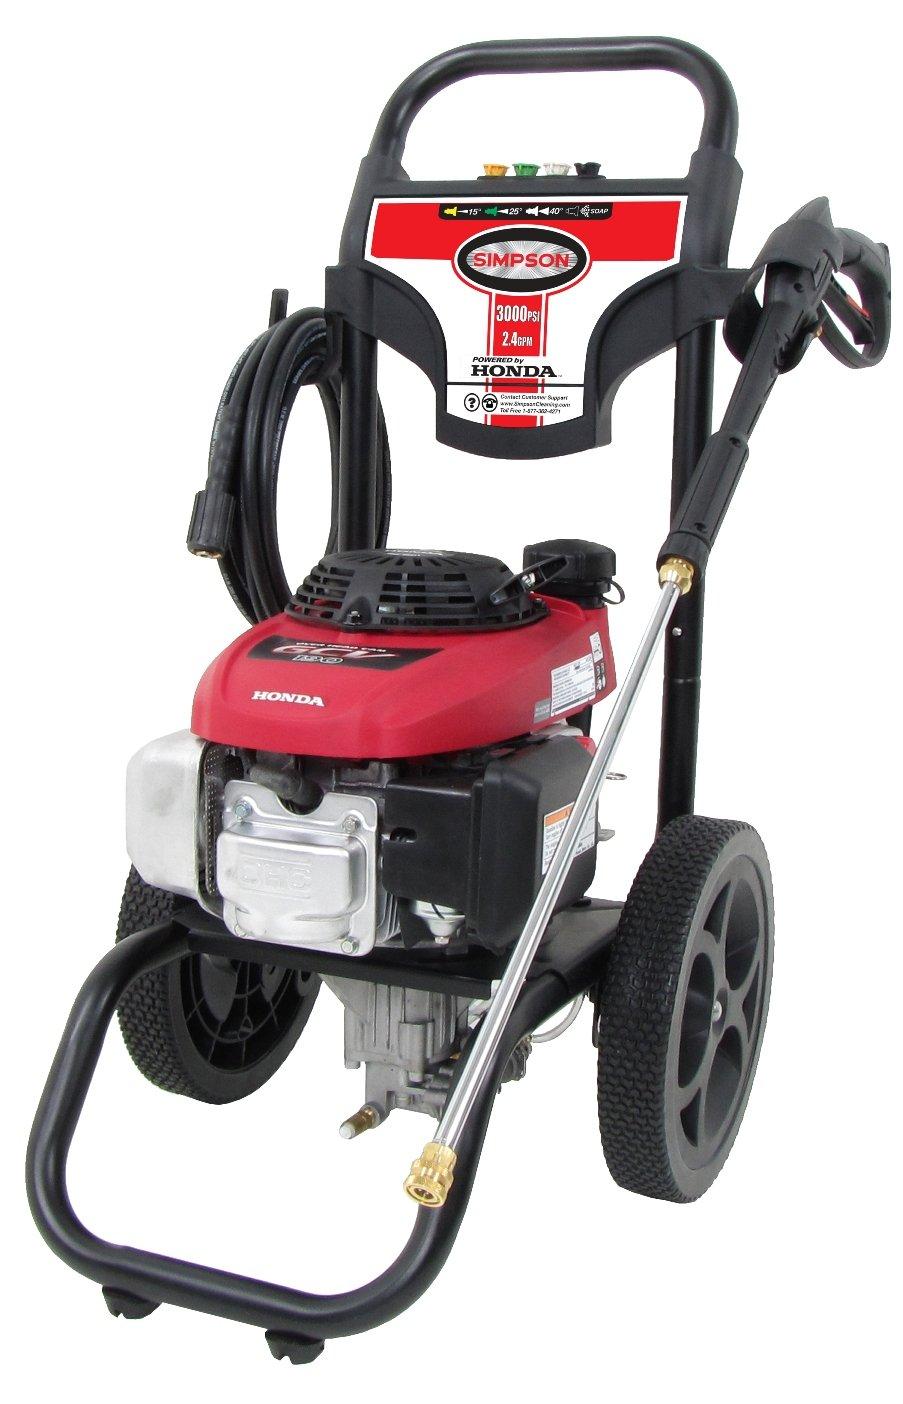 Captivating Amazon.com : Simpson MSV3024 2.4 GPM 3000 PSI 4 Cy Gas Power Pressure Washer  W/Honda Engine : Garden U0026 Outdoor